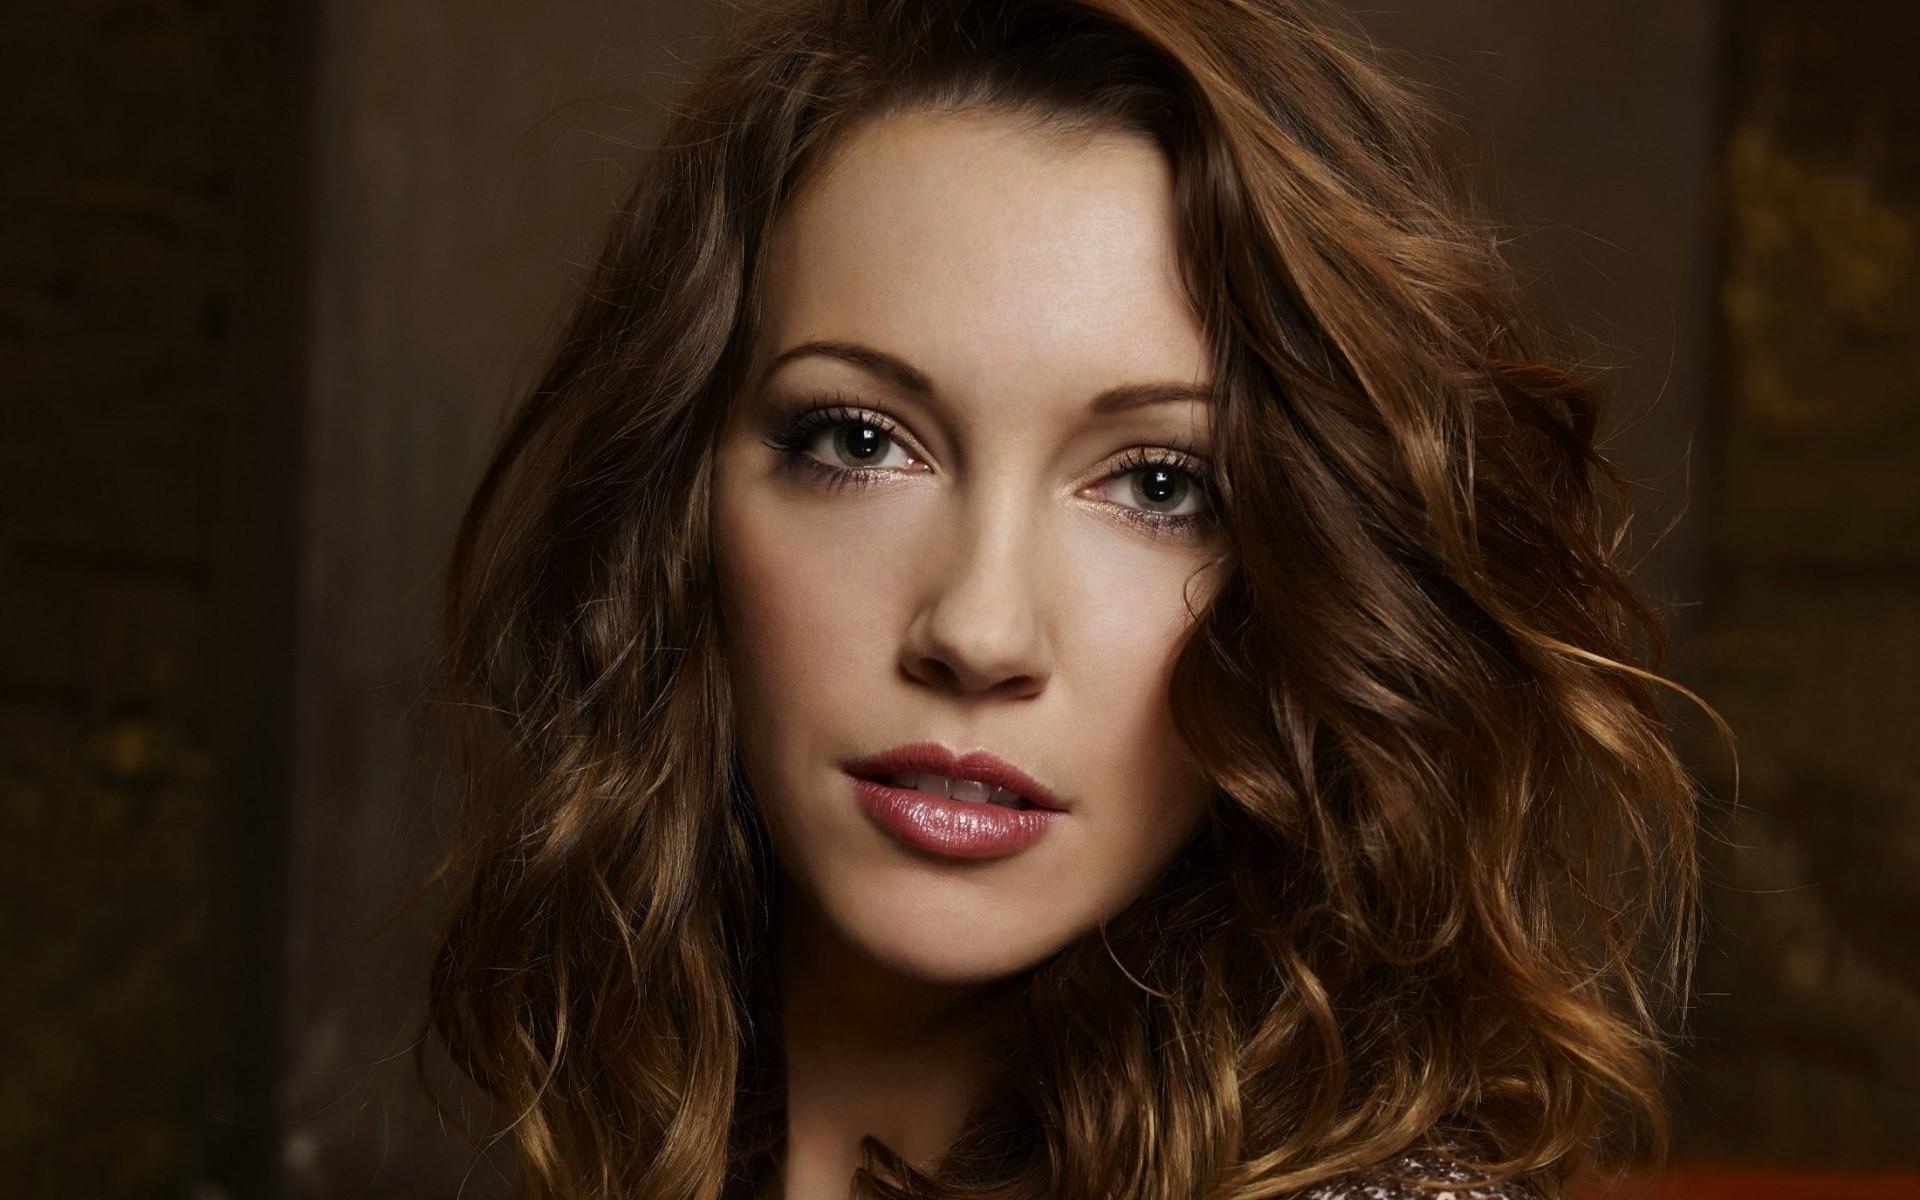 Gorgeous Katie Cassidy Wallpaper 37944 1920x1200 px